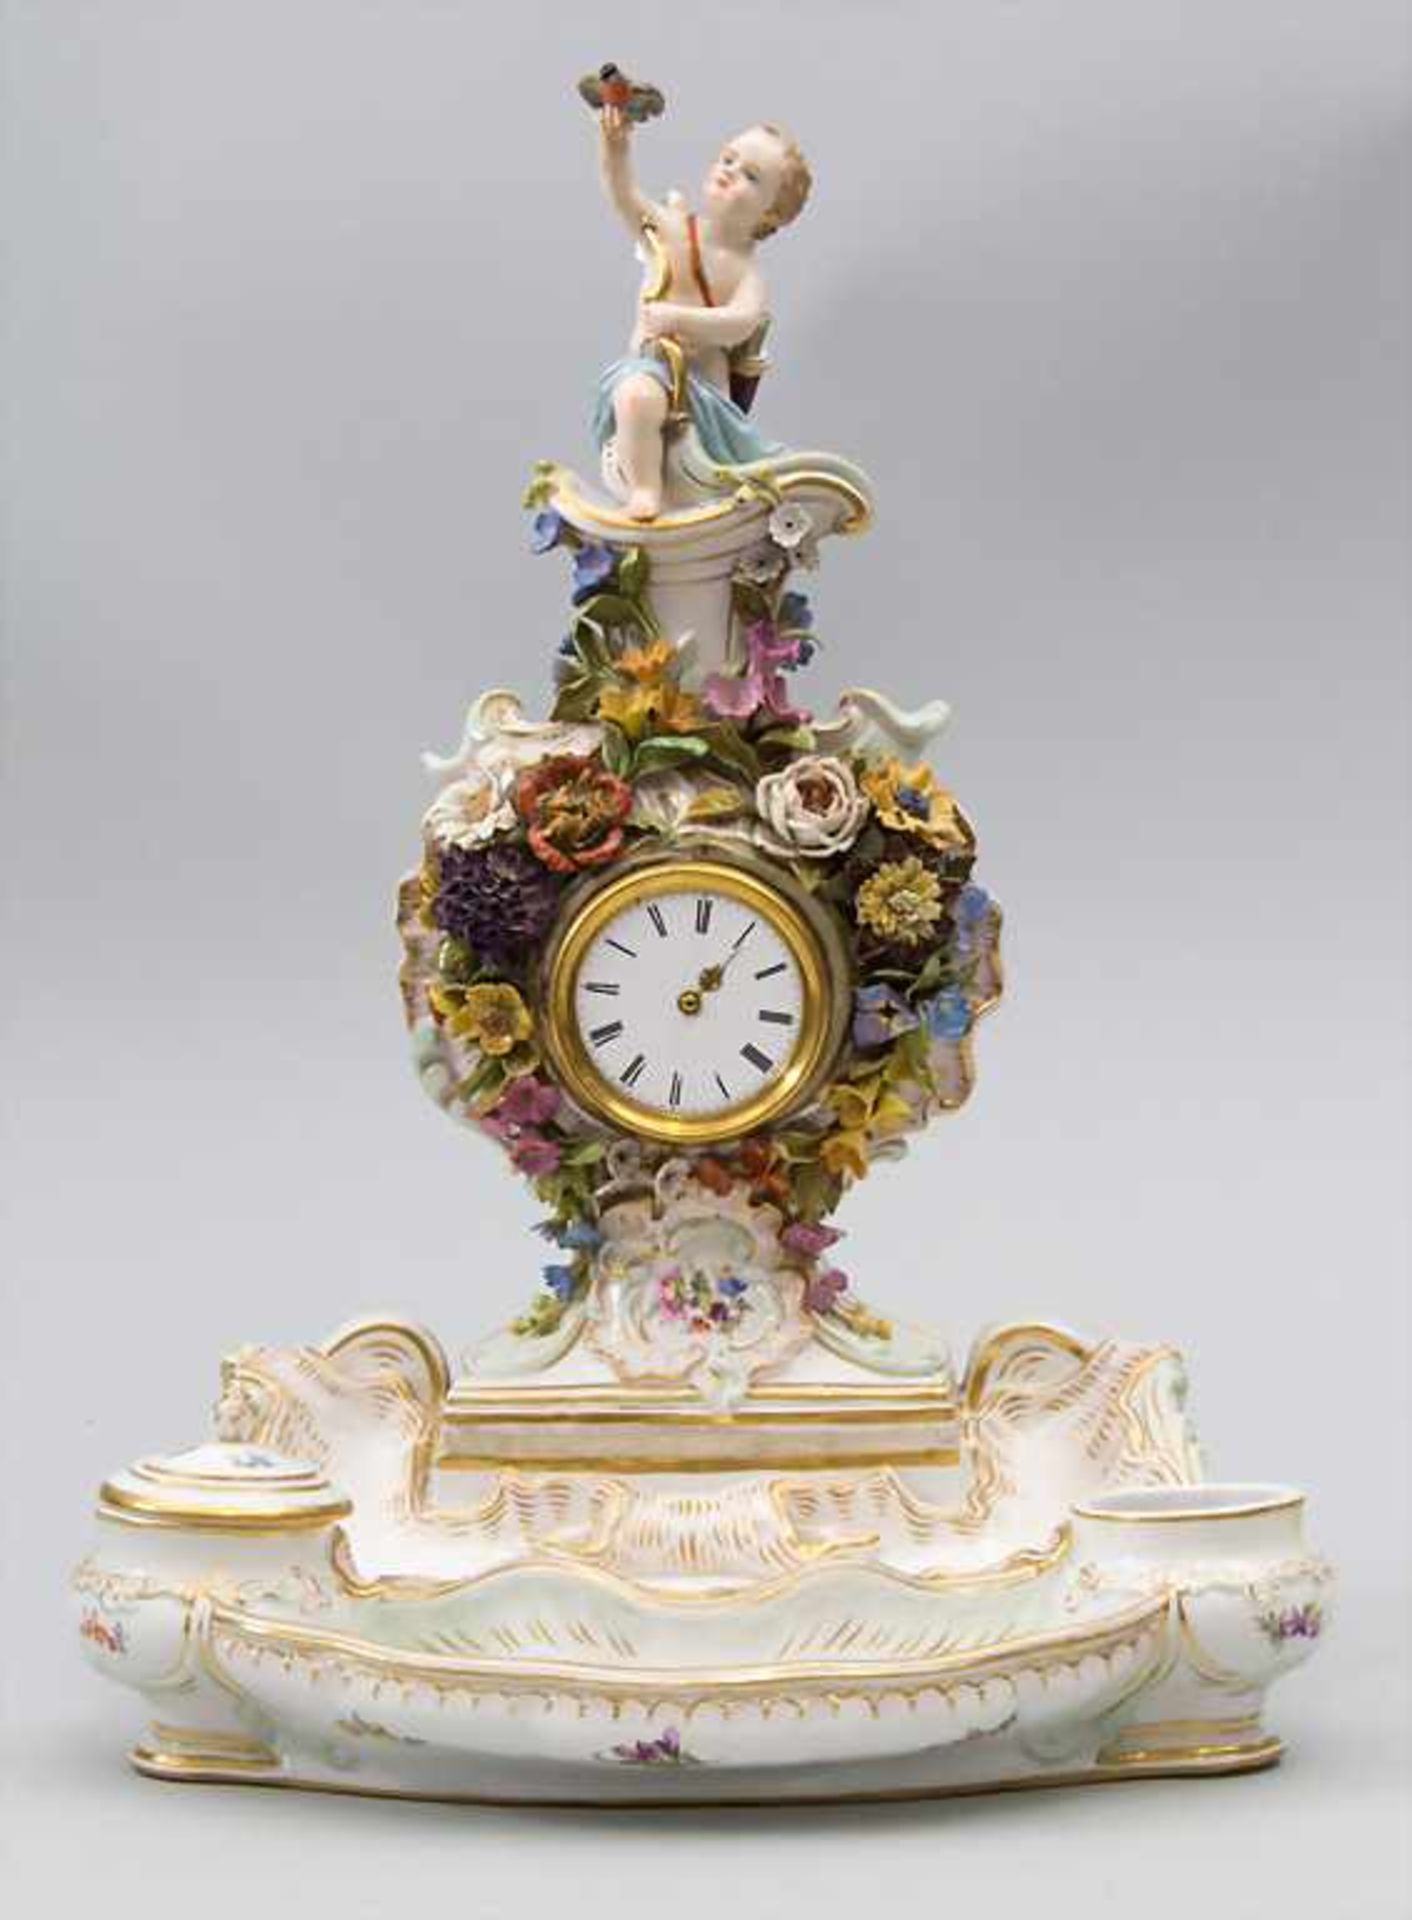 Seltene Tischuhr mit integriertem Schreibset / A rare porcelain table clock with integrated